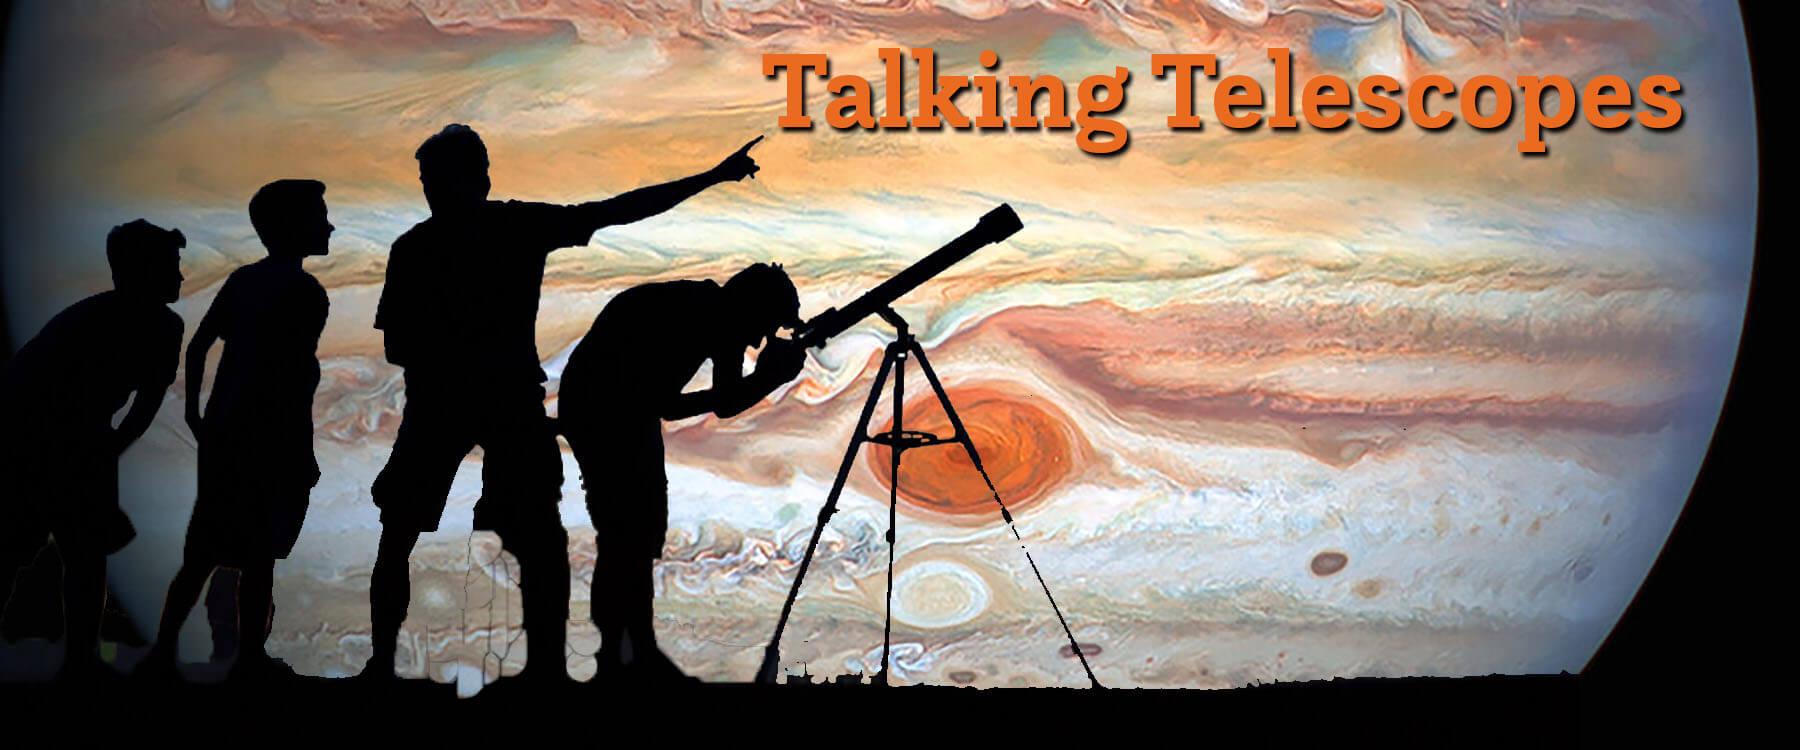 Talking Telescopes